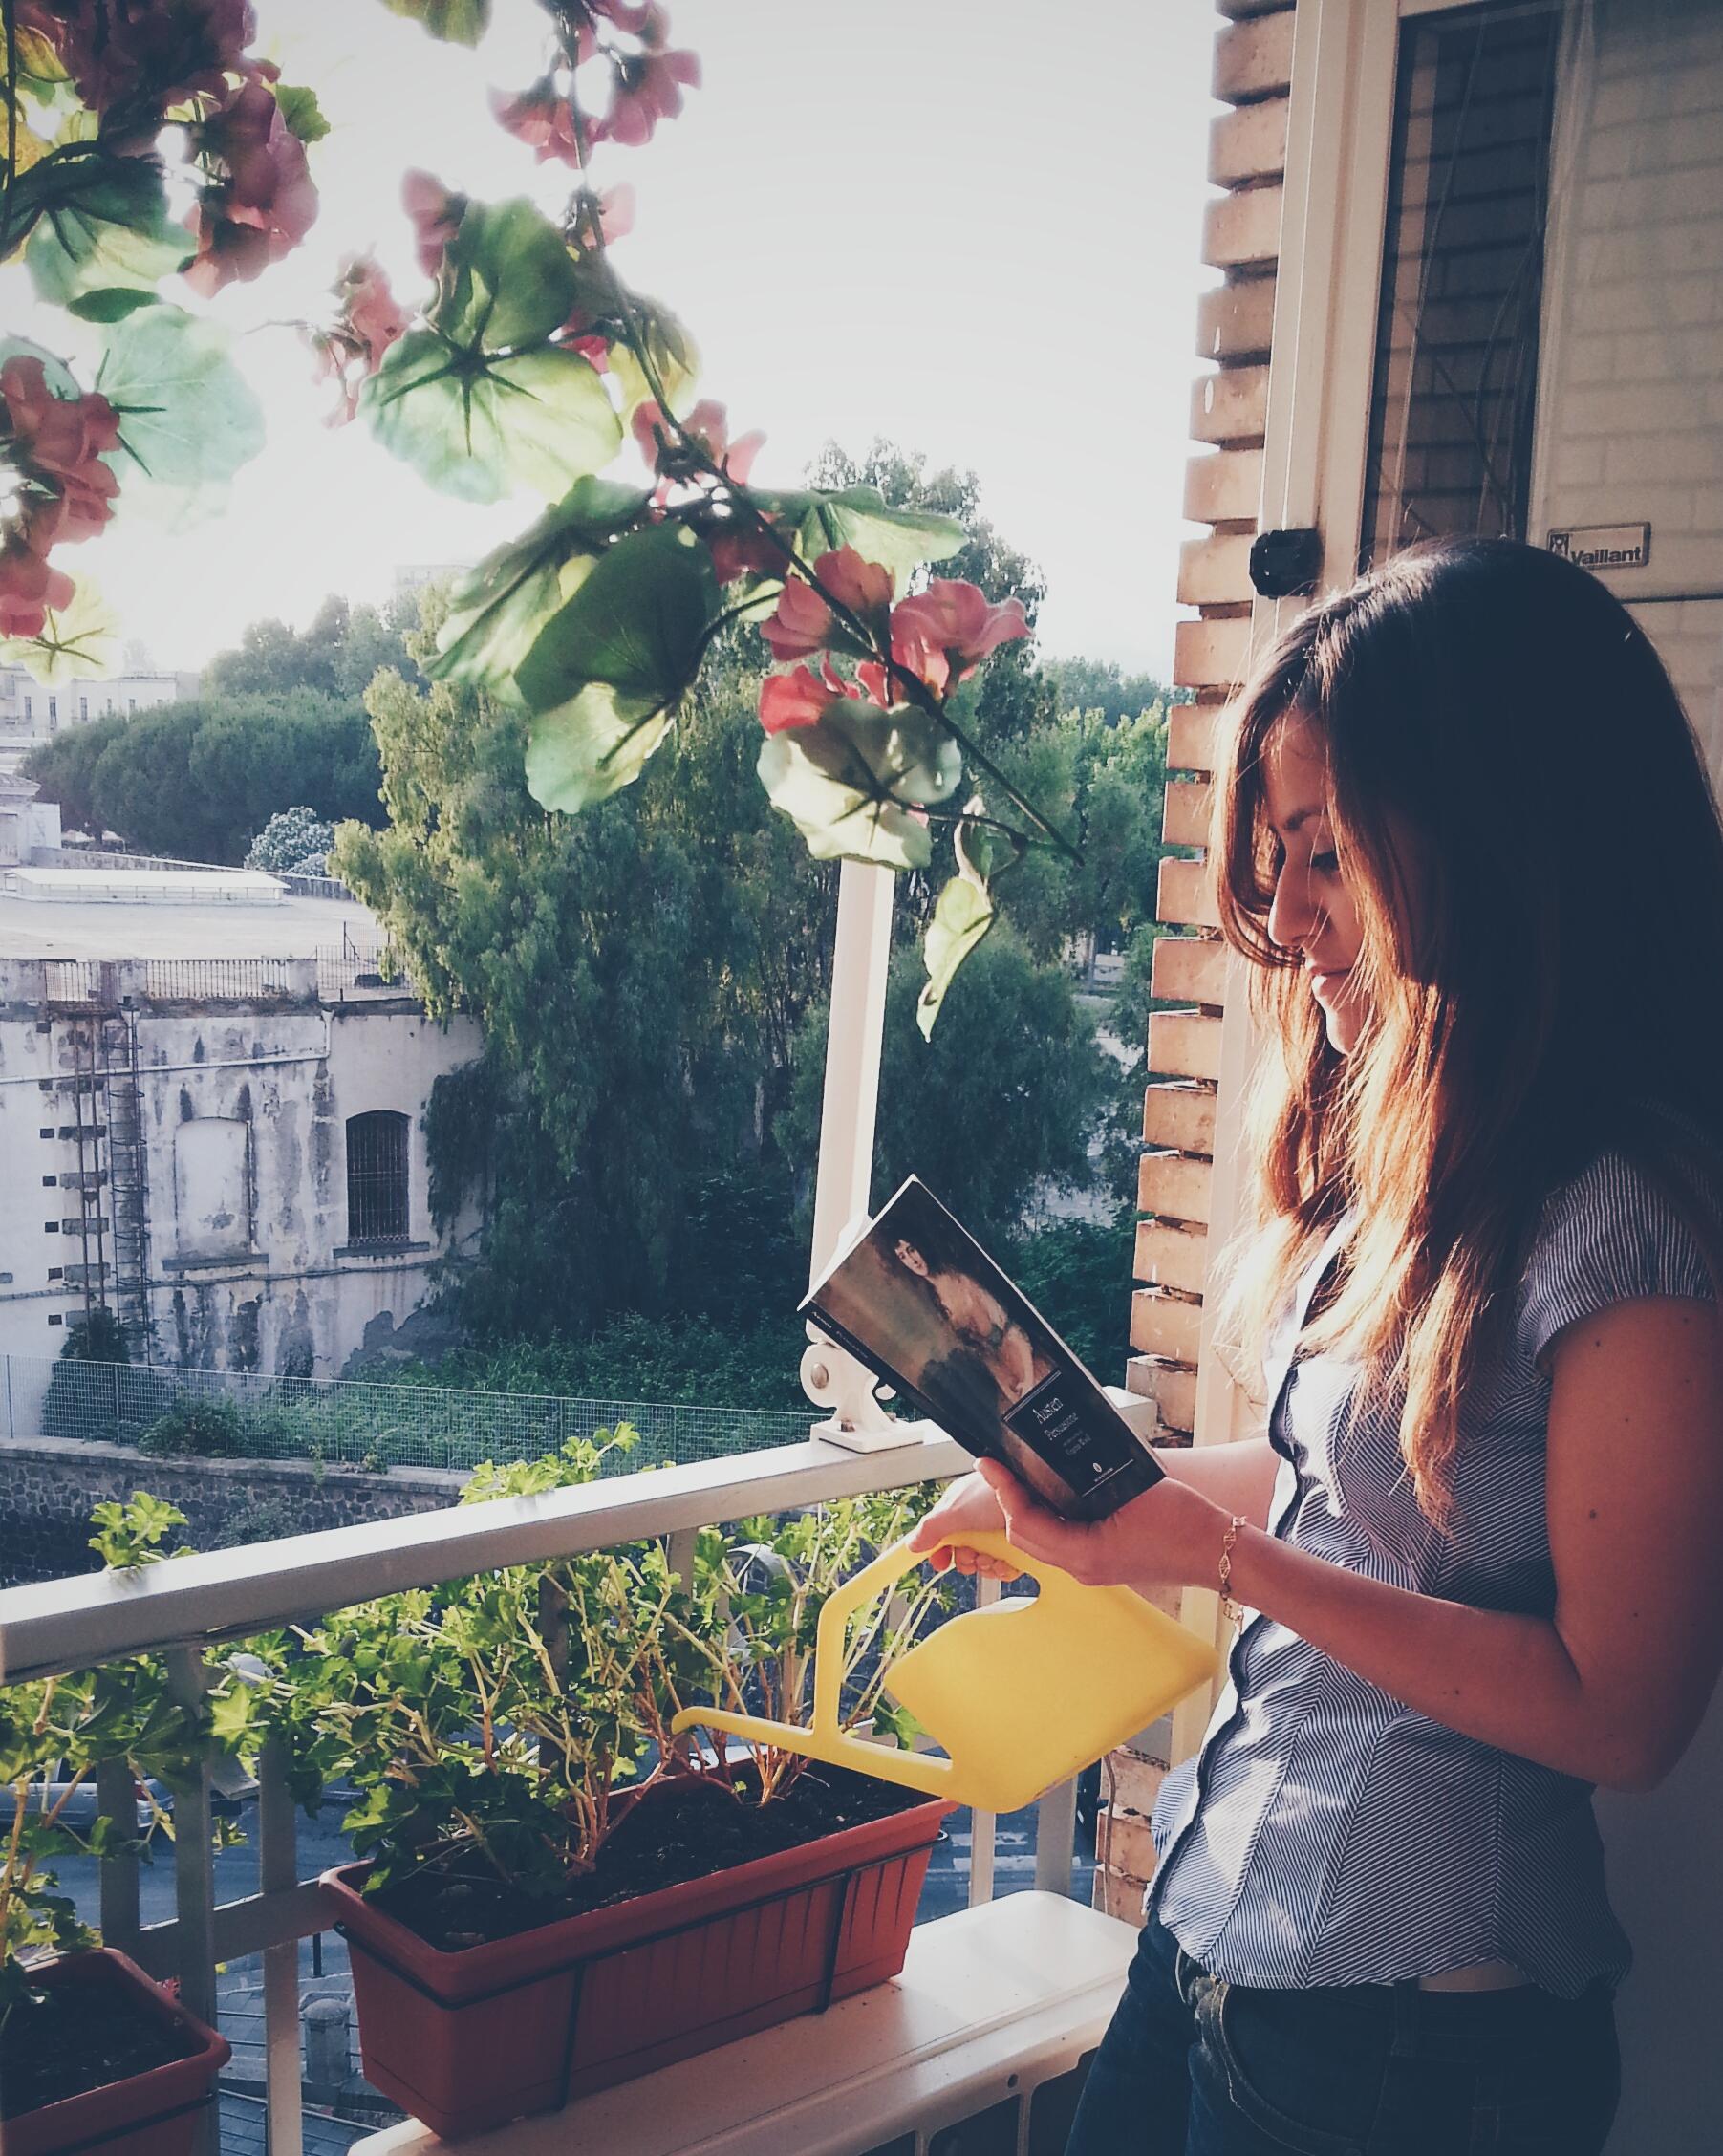 concorso Clickbook, Graus Editore - Samsung Galaxy S Note II - Mafalda de Simone